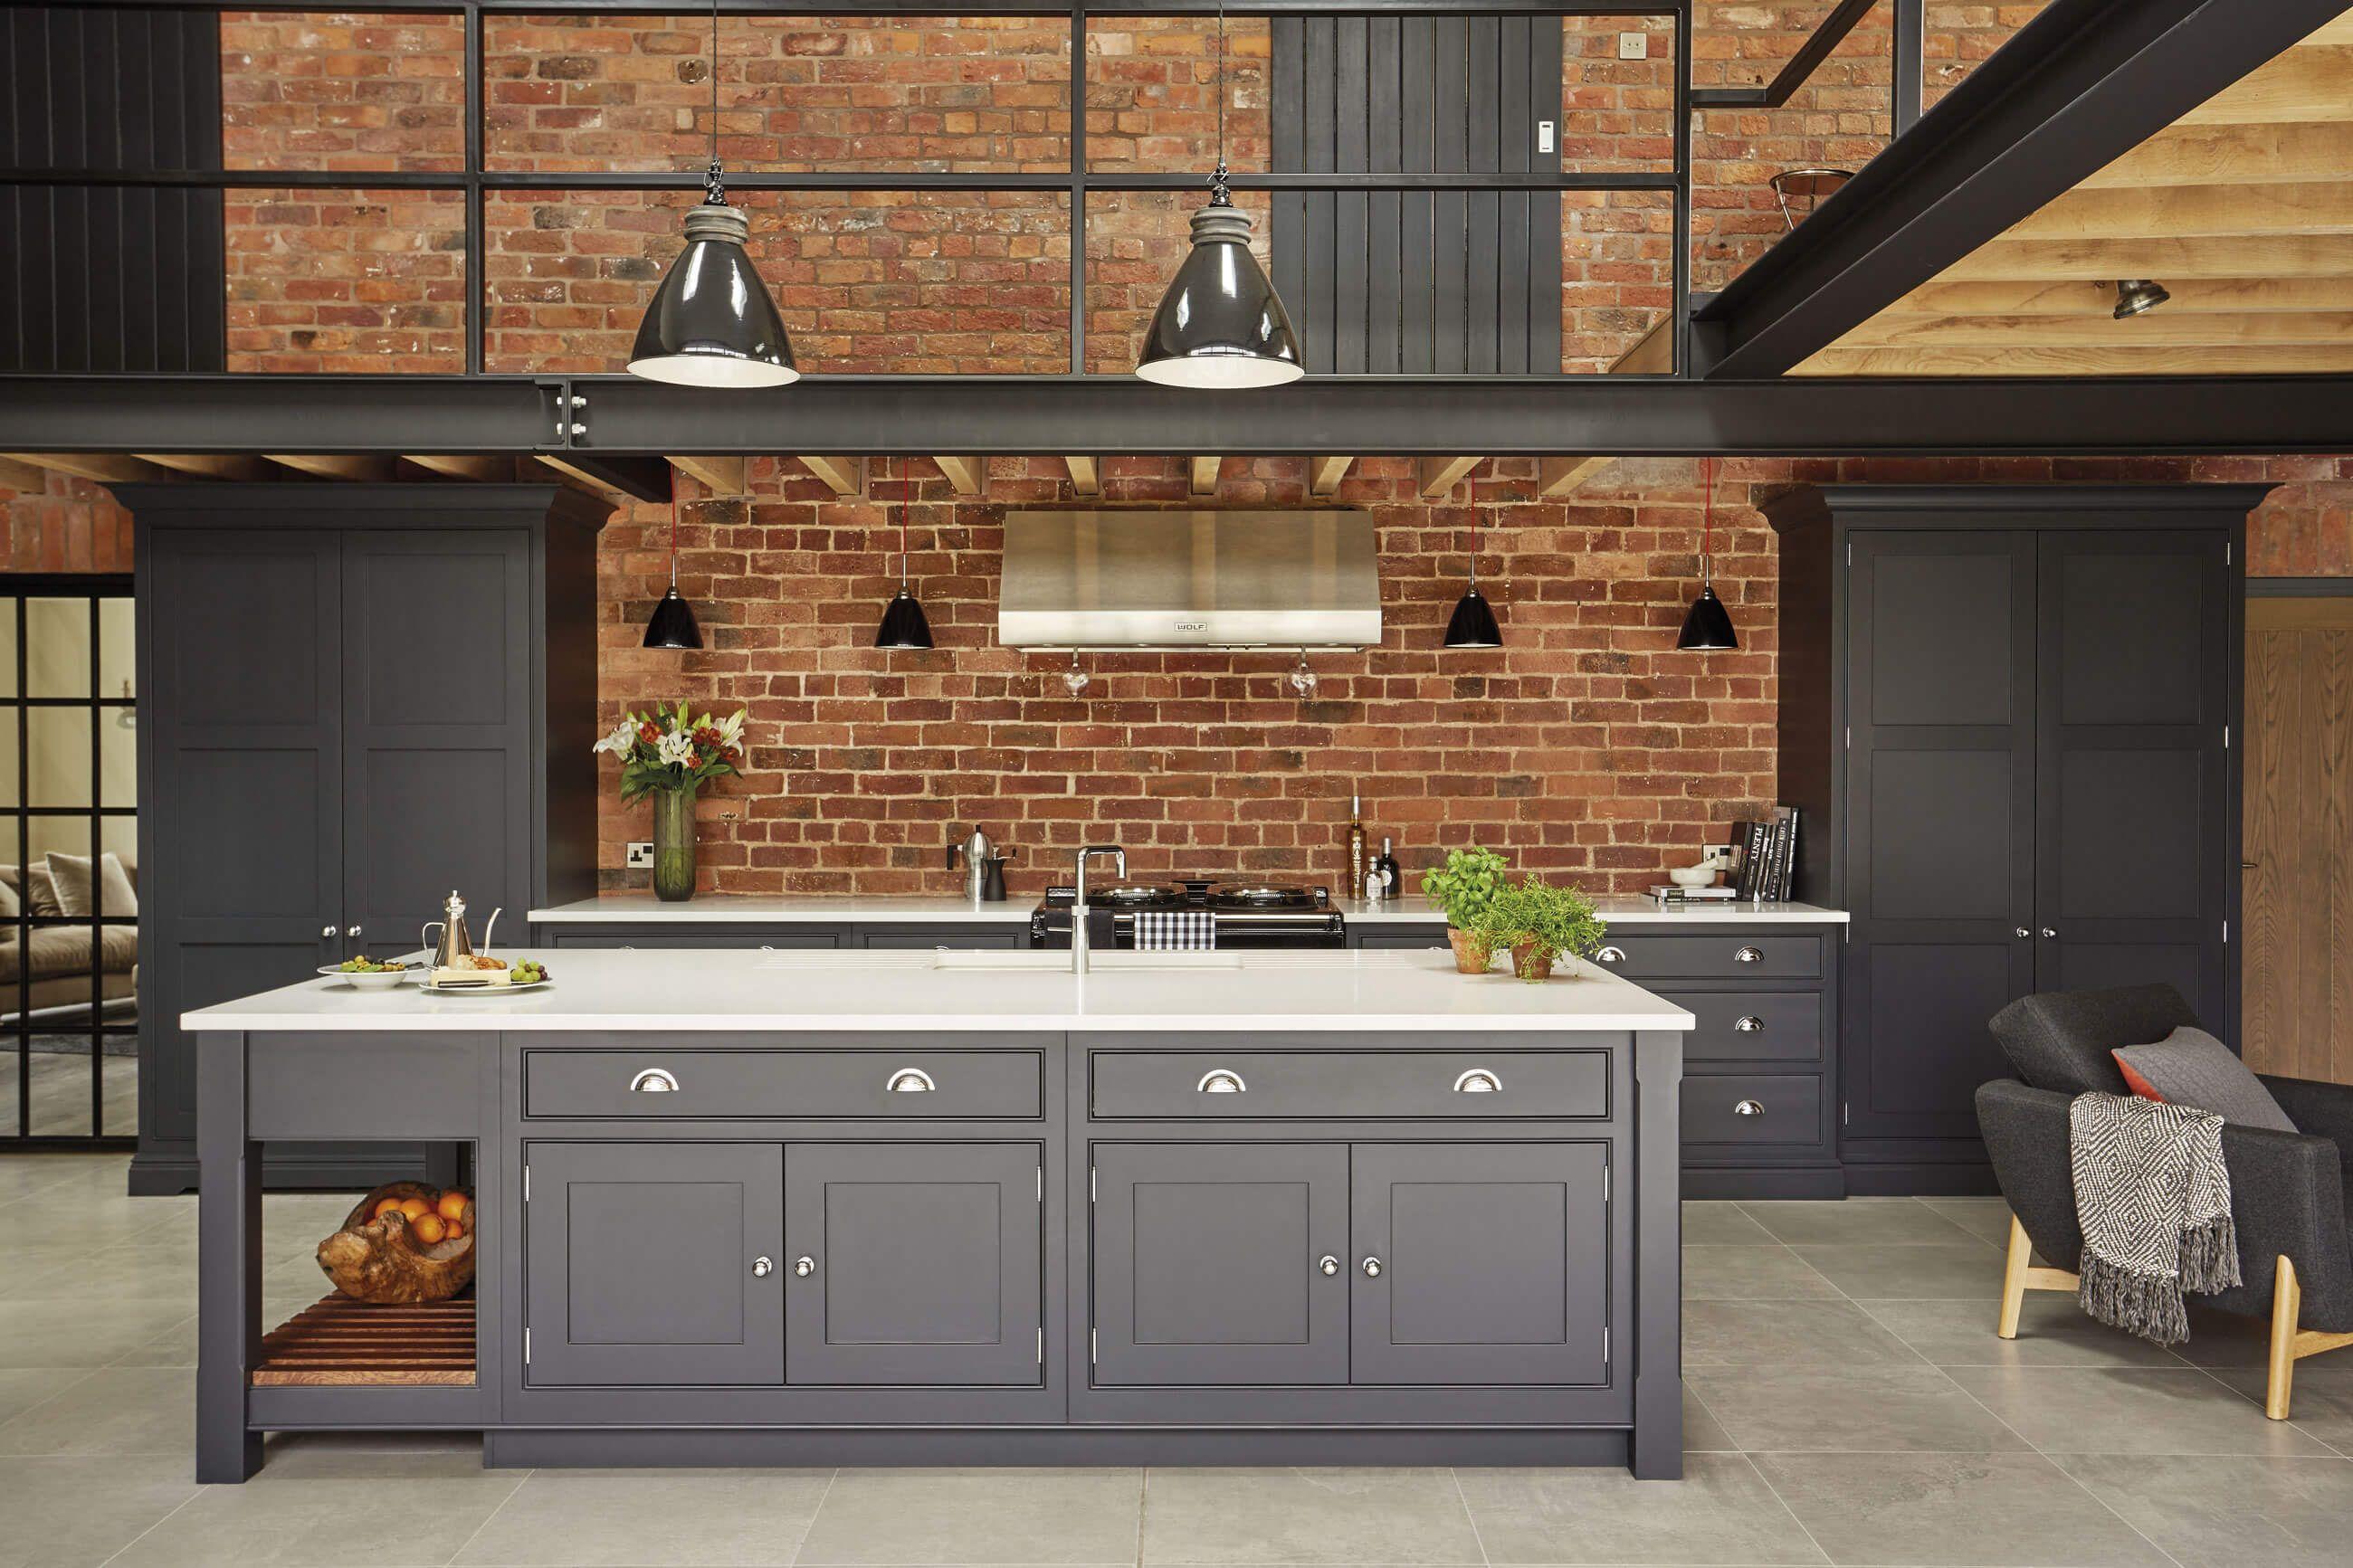 Industrial Style Kitchen Кирпичная кухня, Современный